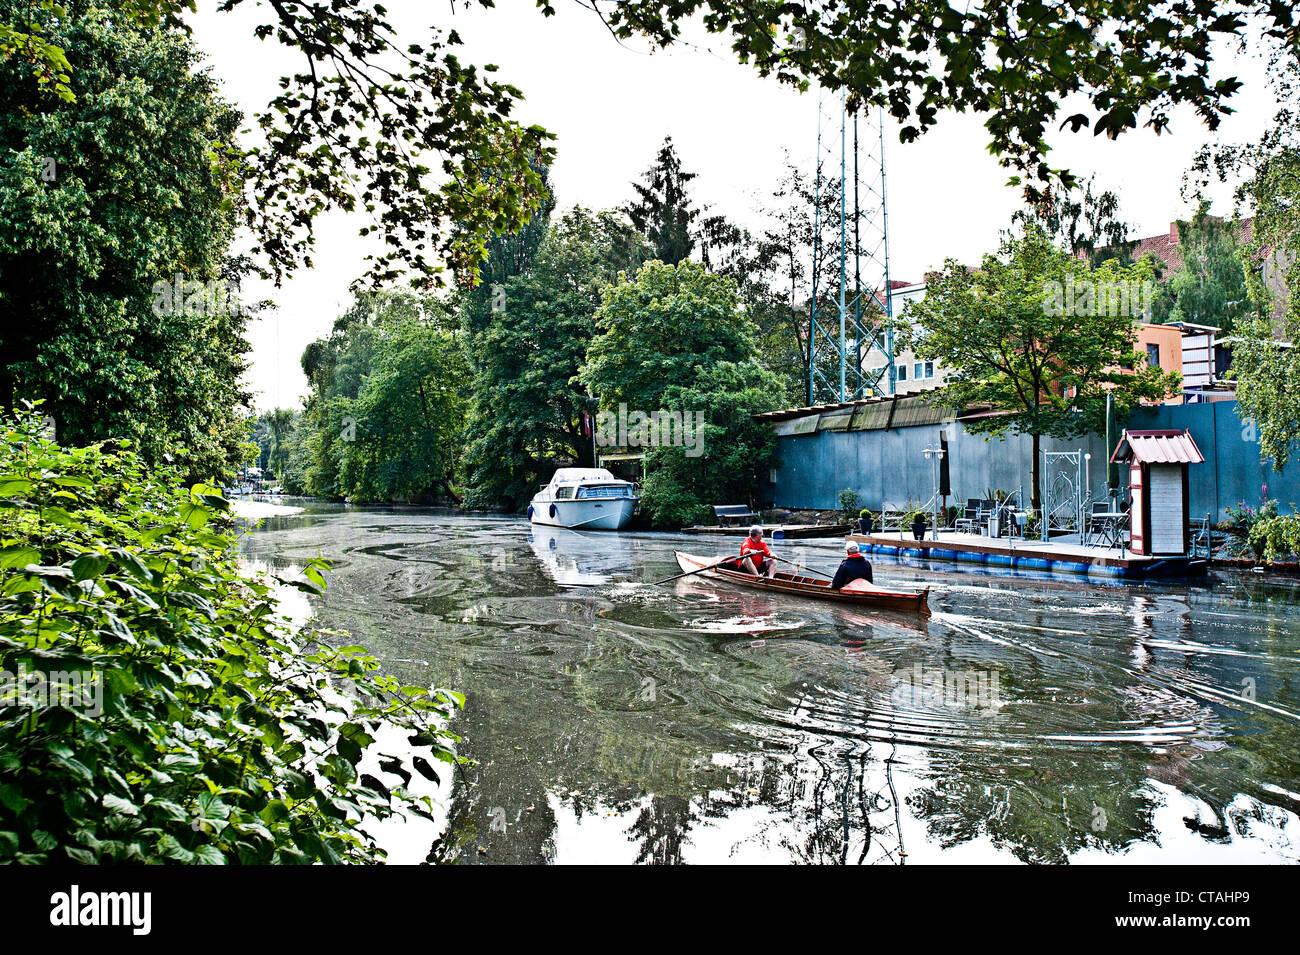 Vogatore sulla Ernst-August-Canal, Wilhelmsburg, Amburgo, Germania Immagini Stock